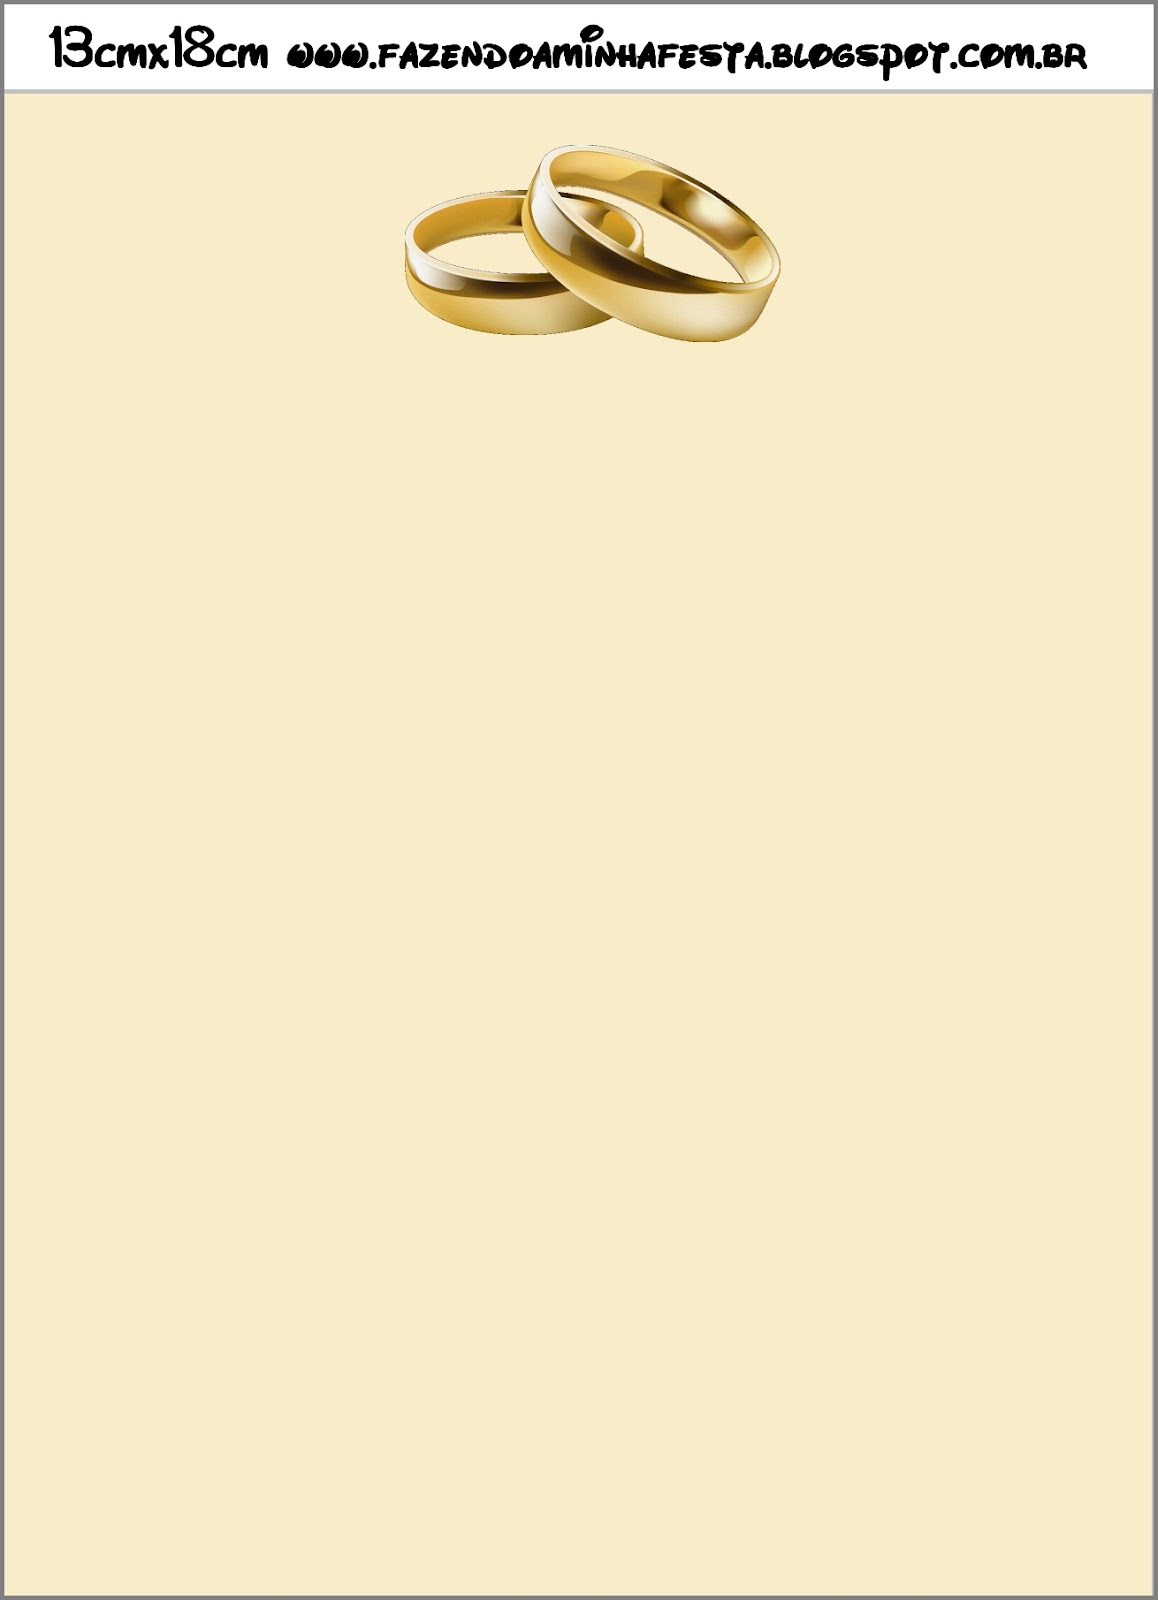 Convites de Casamento Simples - Papel e Estilo Convites